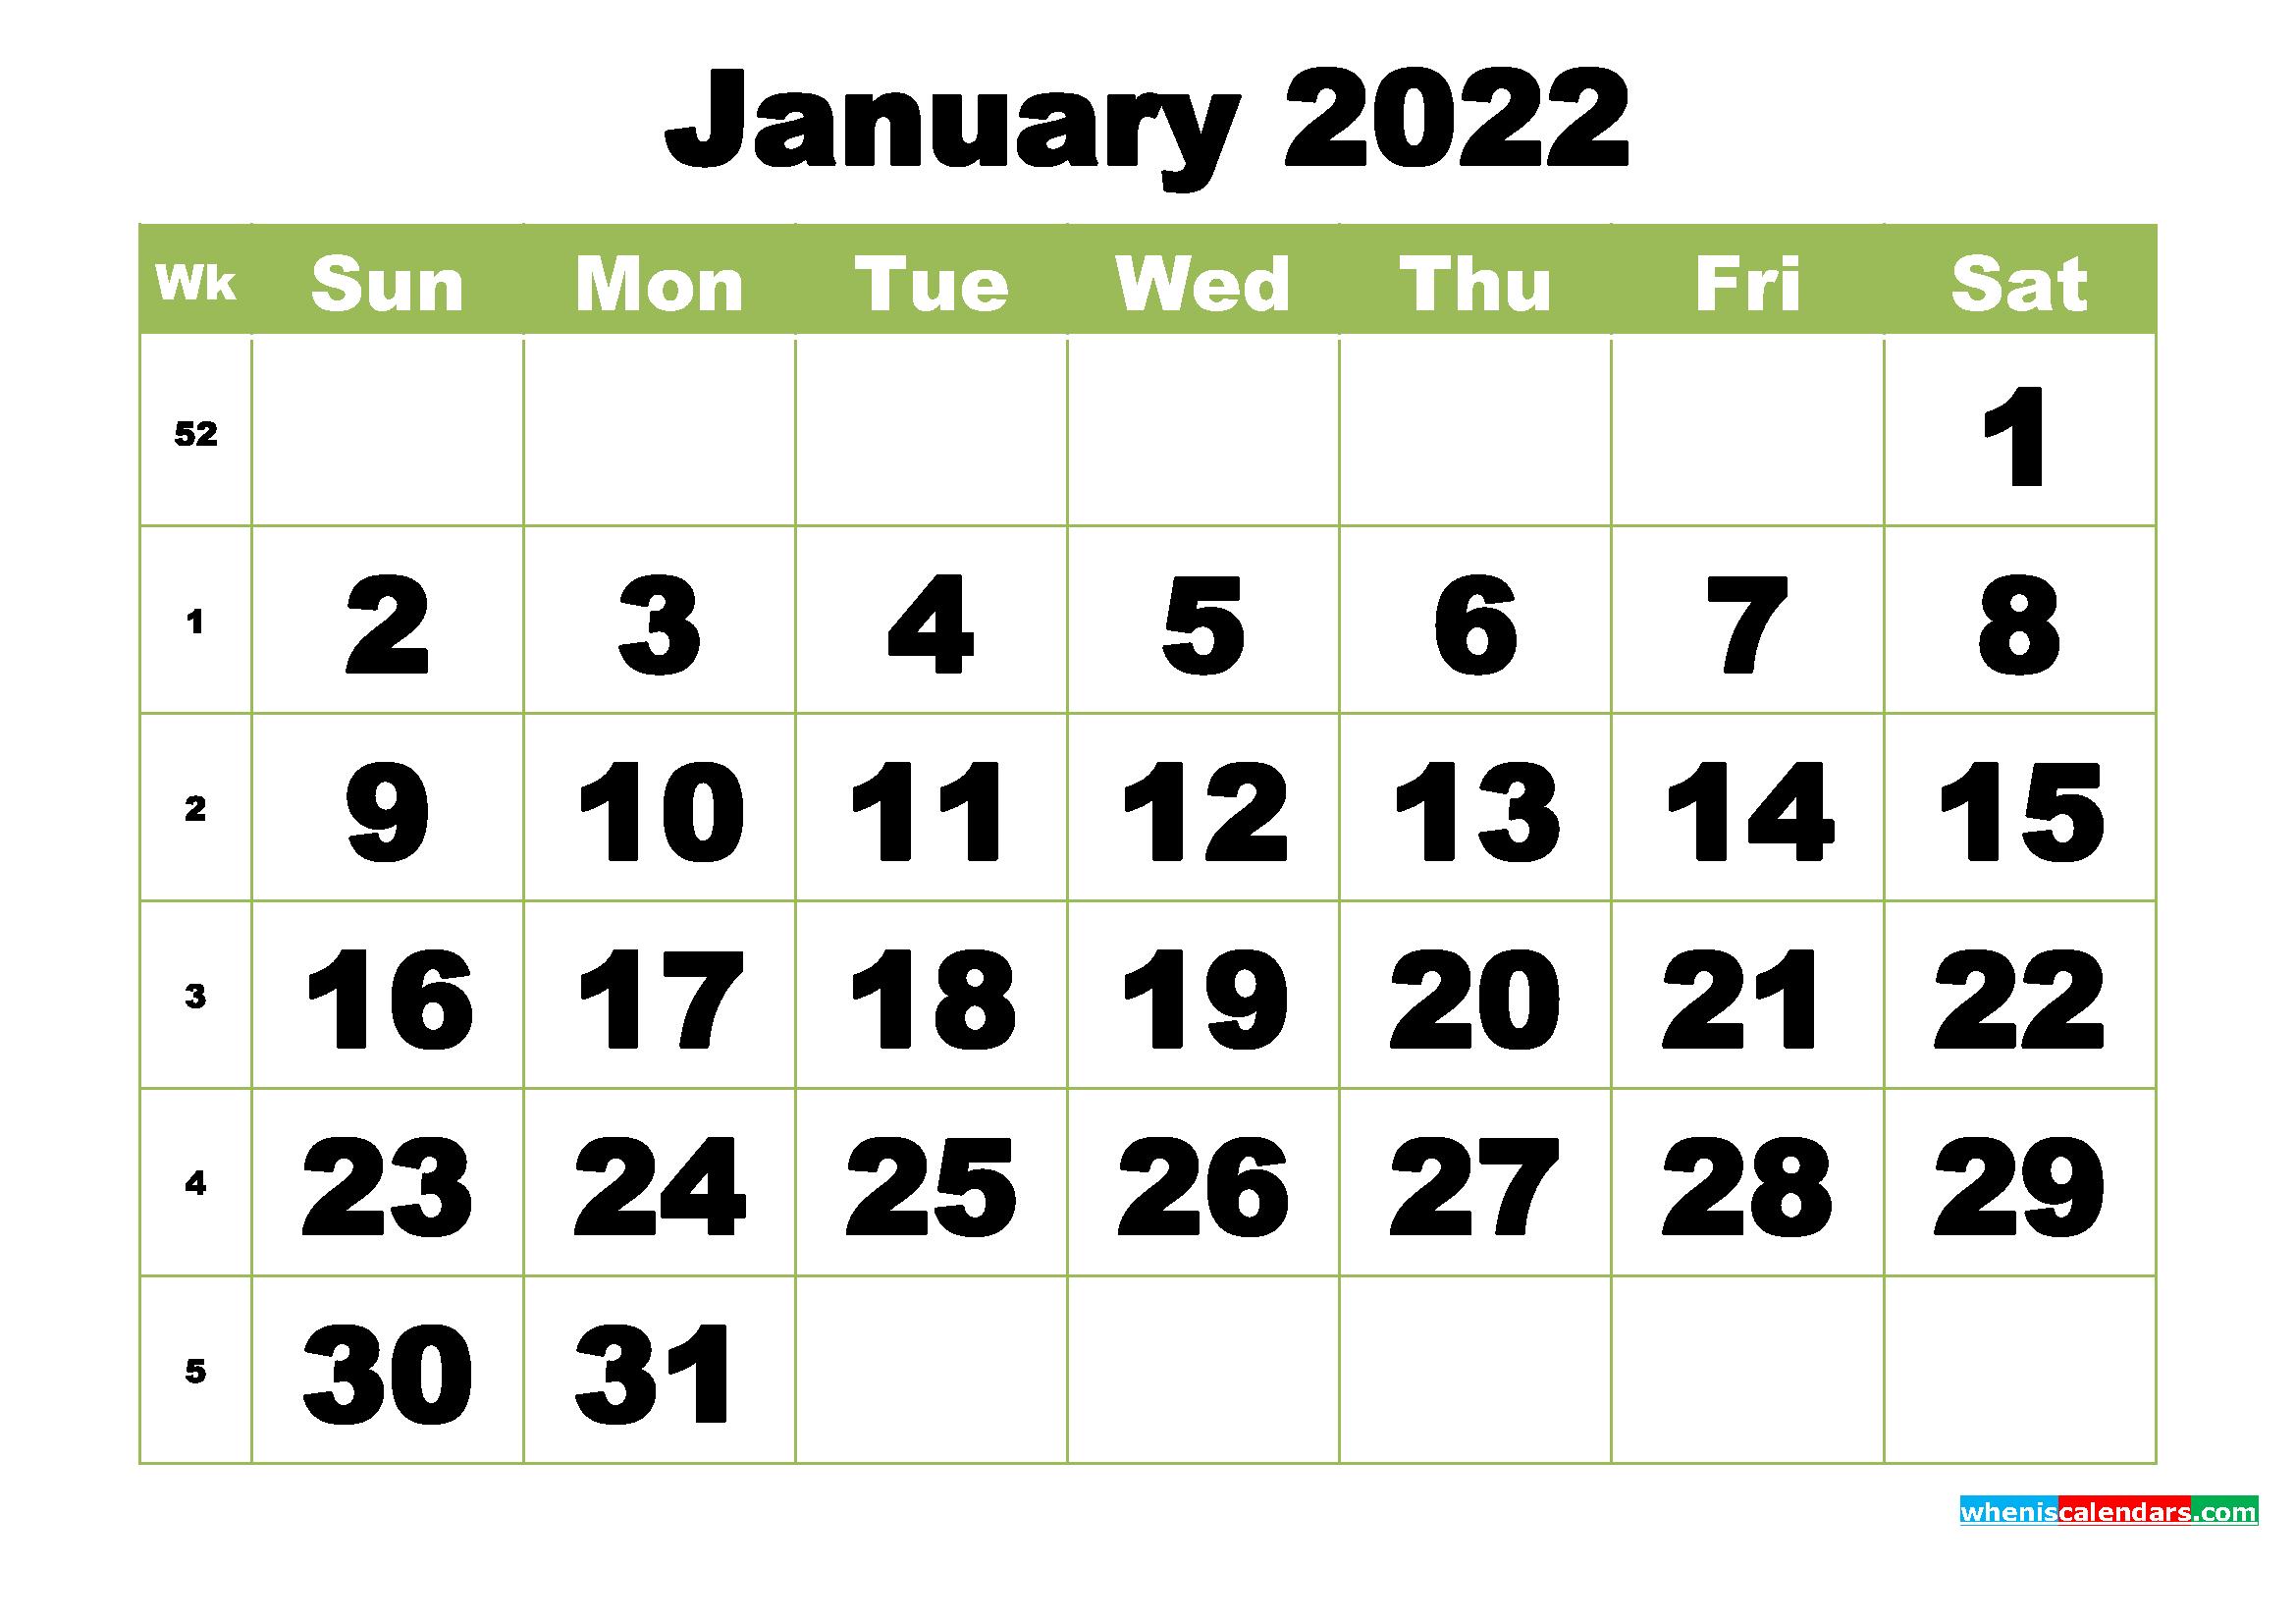 Free Printable Monthly Calendar January 2022 - Free with January 2022 Printable Calendar Photo